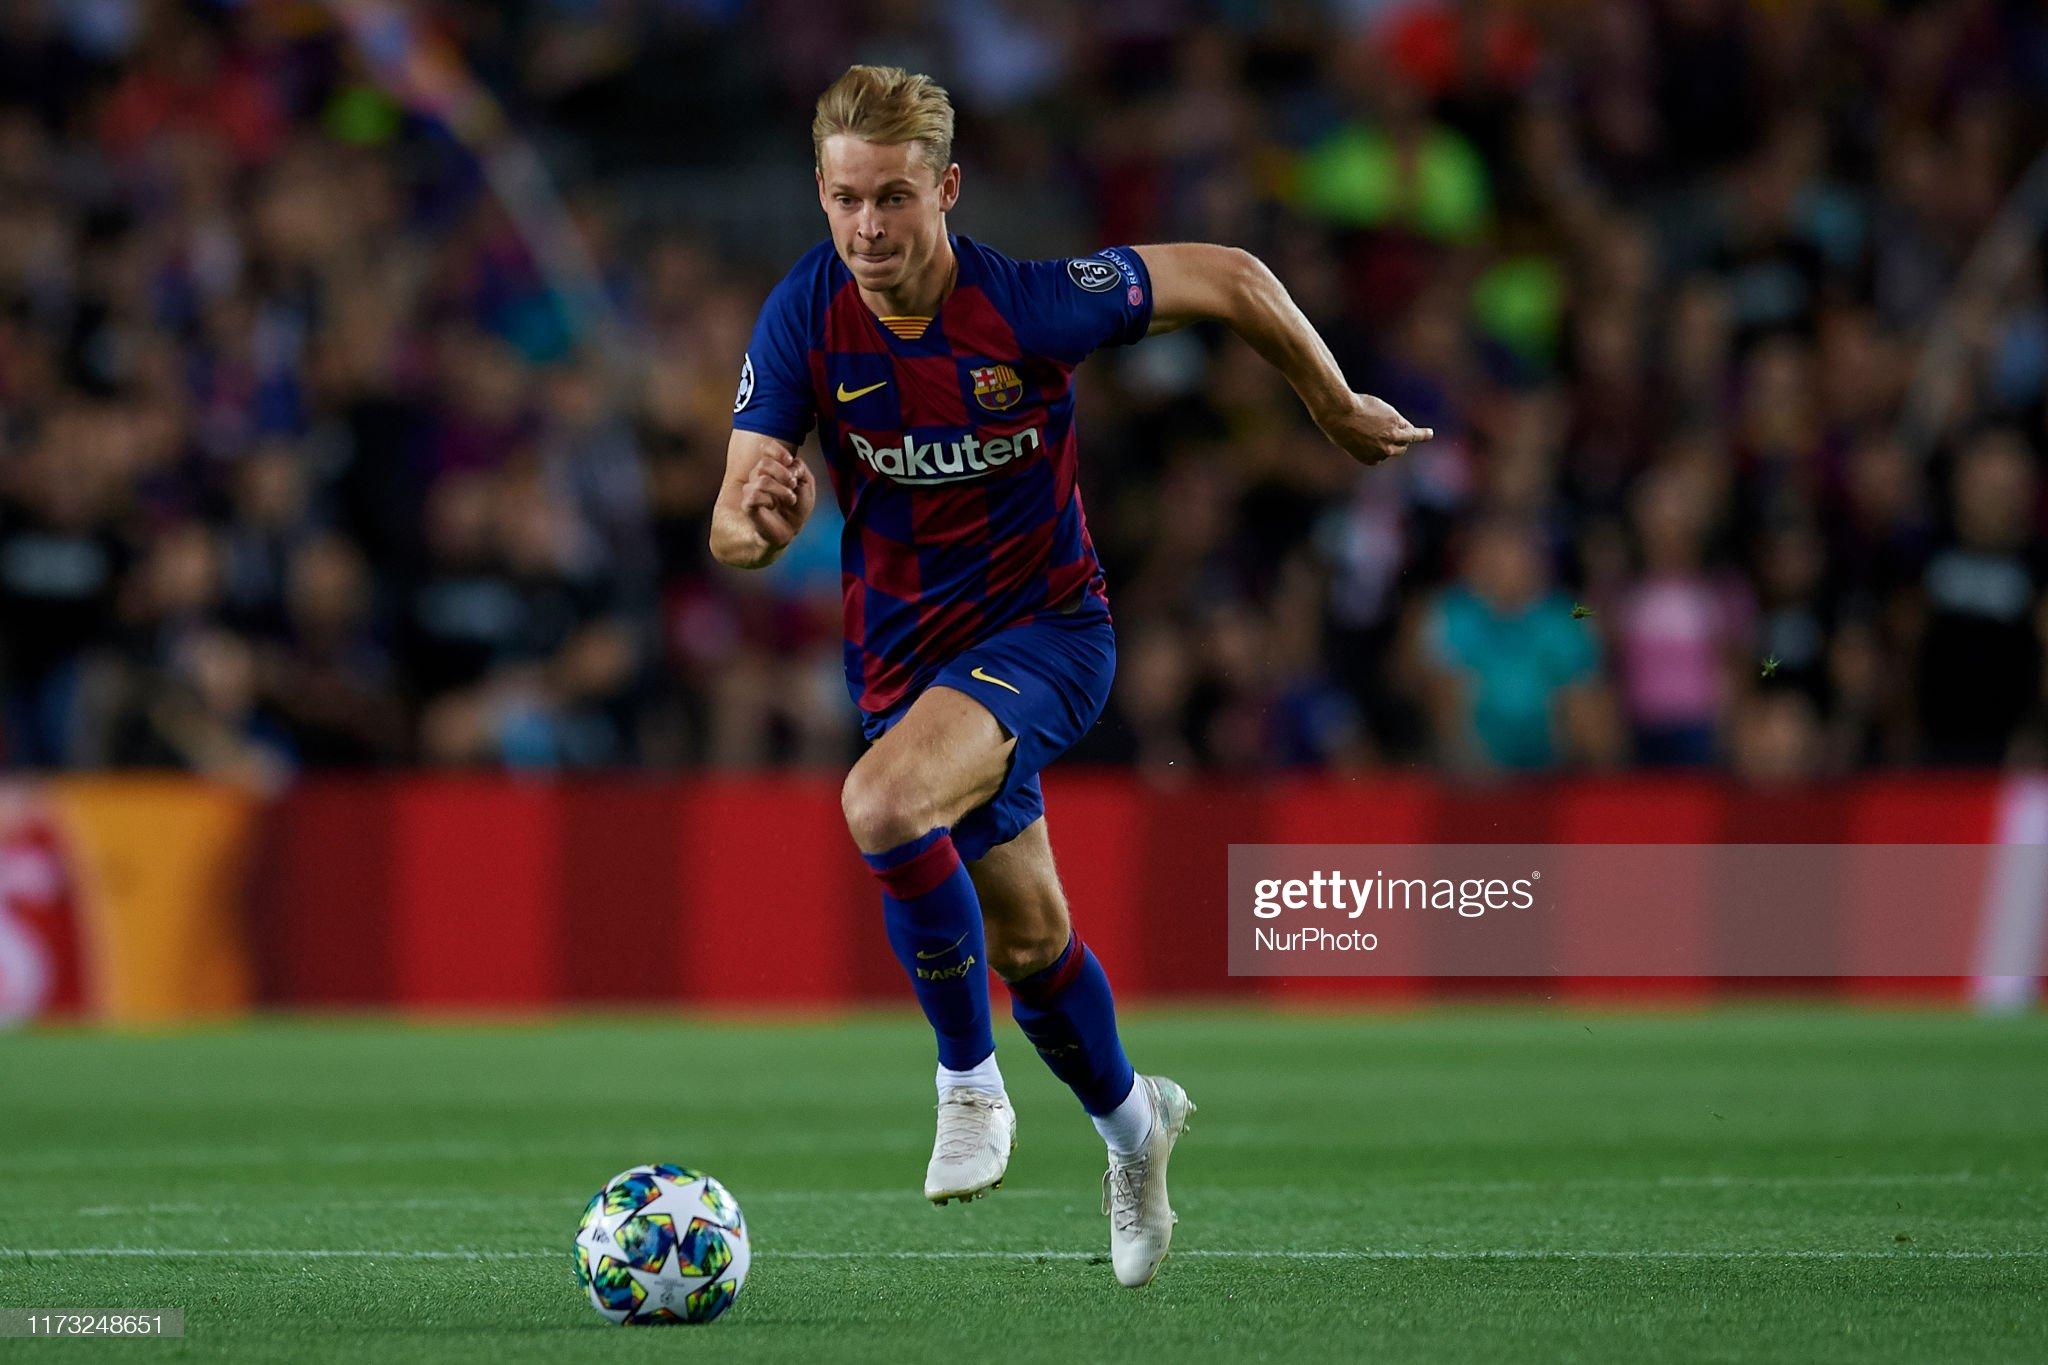 صور مباراة : برشلونة - إنتر 2-1 ( 02-10-2019 )  Frenkie-de-jong-of-barcelona-in-action-during-the-uefa-champions-f-picture-id1173248651?s=2048x2048